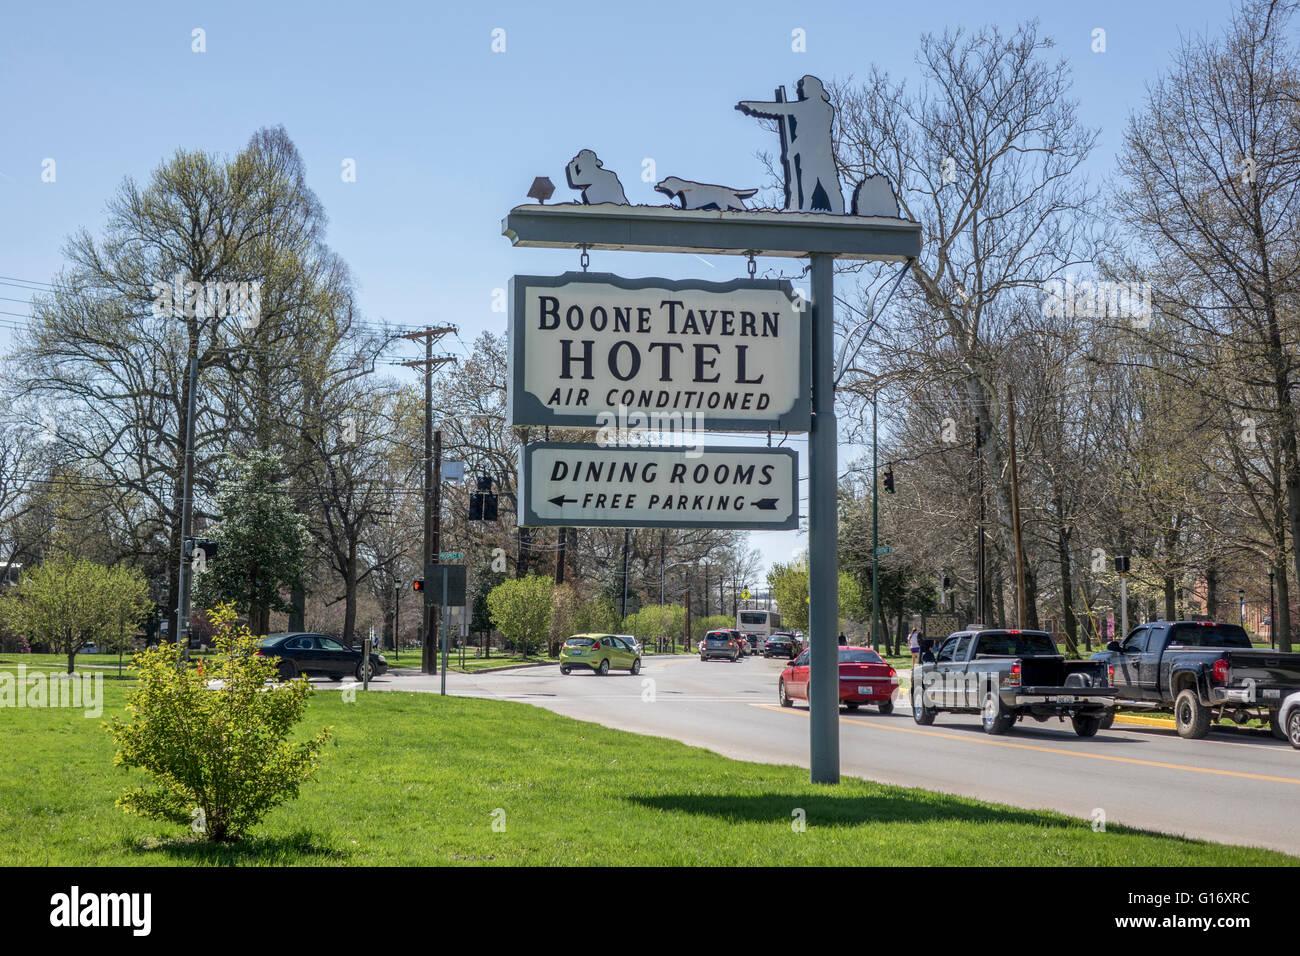 Historic hotels of america stock photos historic hotels - Hacienda interiors boulder city nv ...